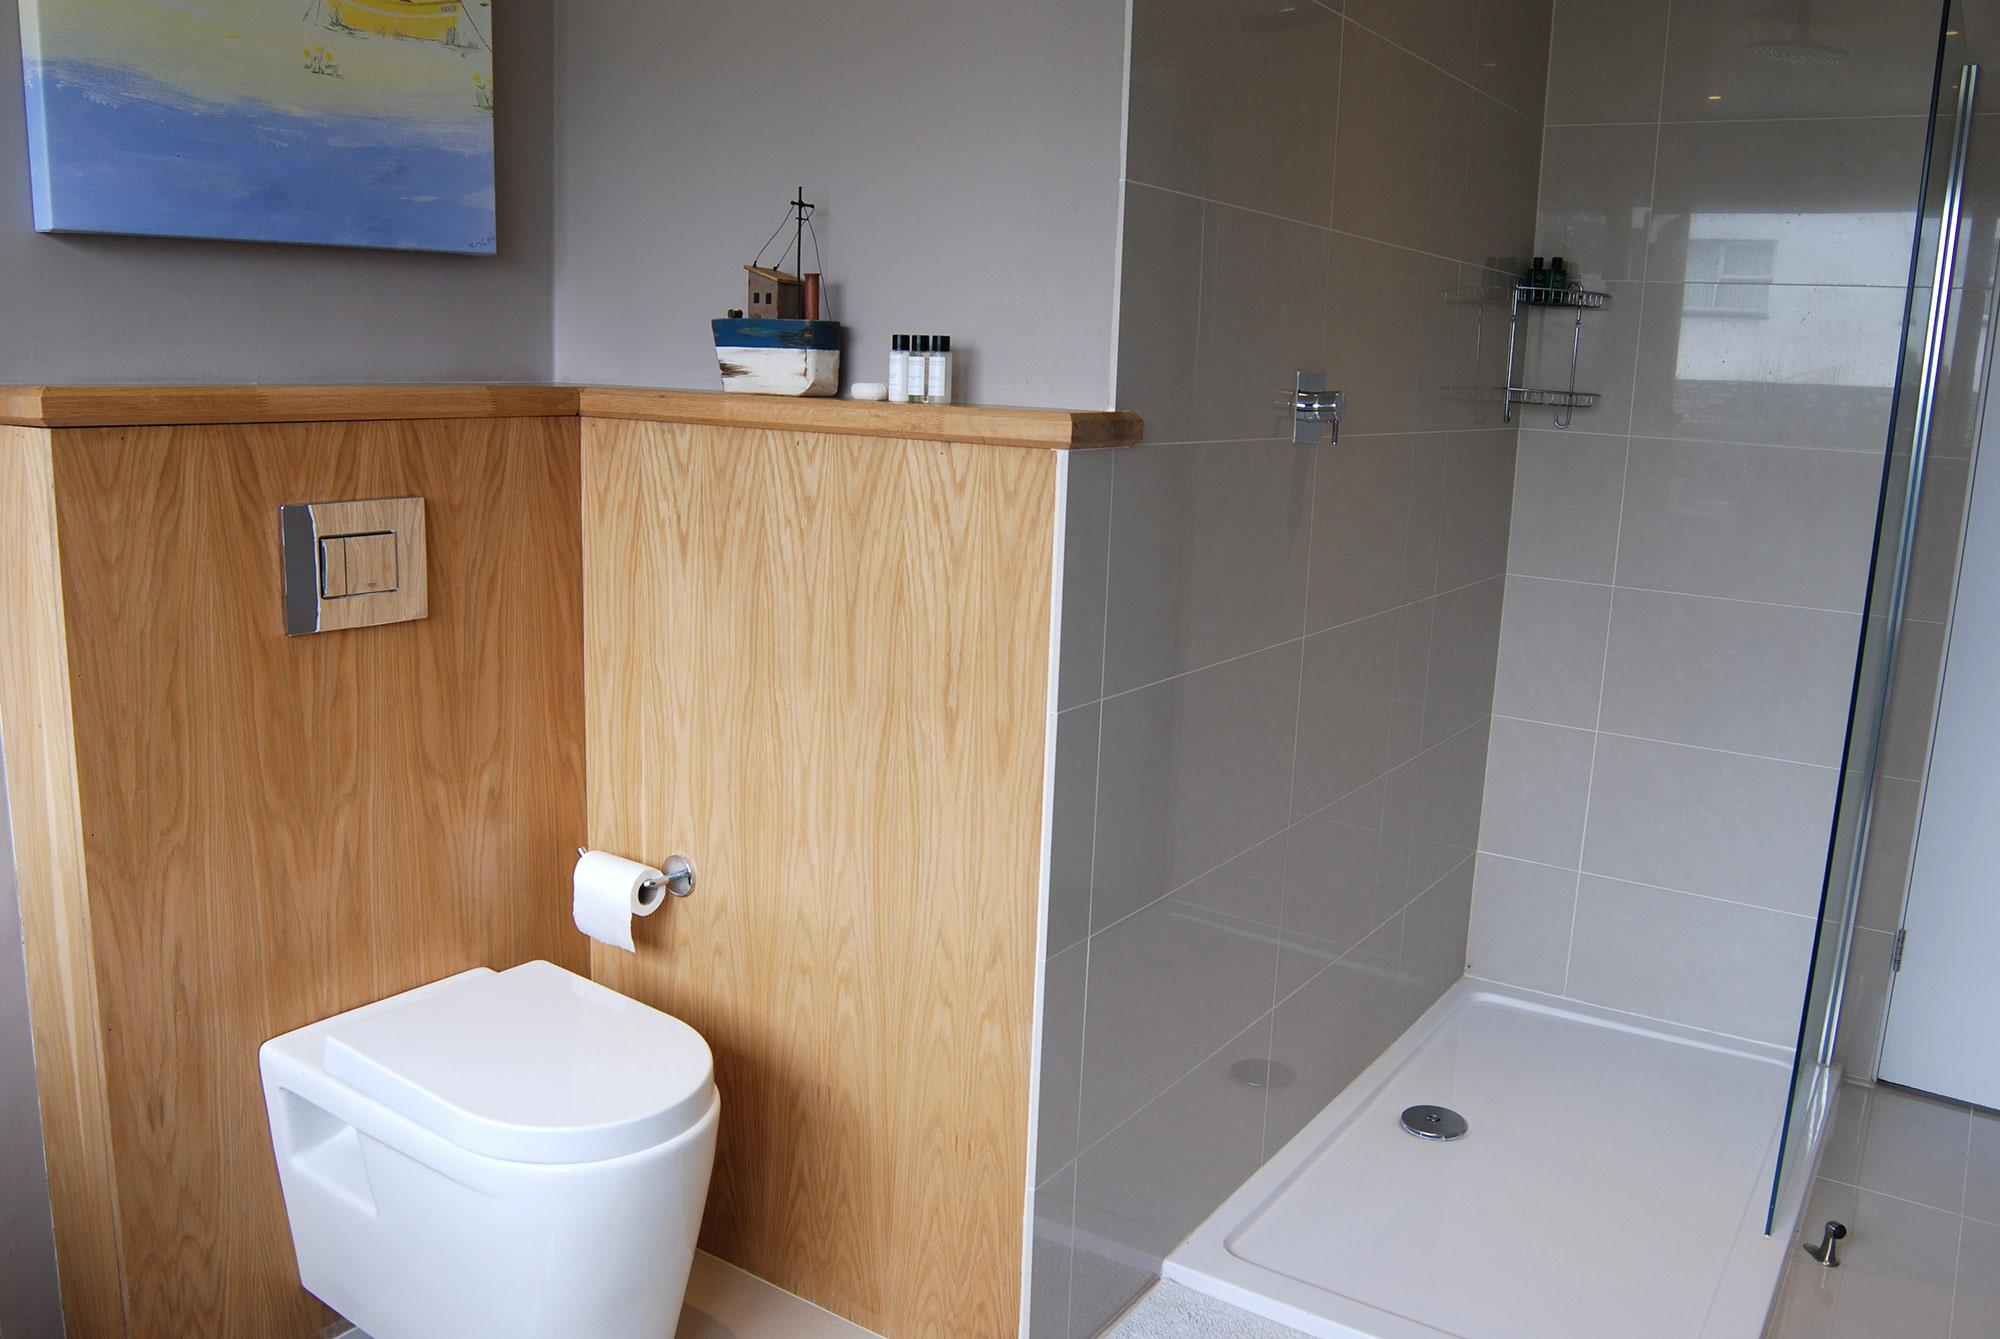 Building Modernization at Gwelanmor toilet